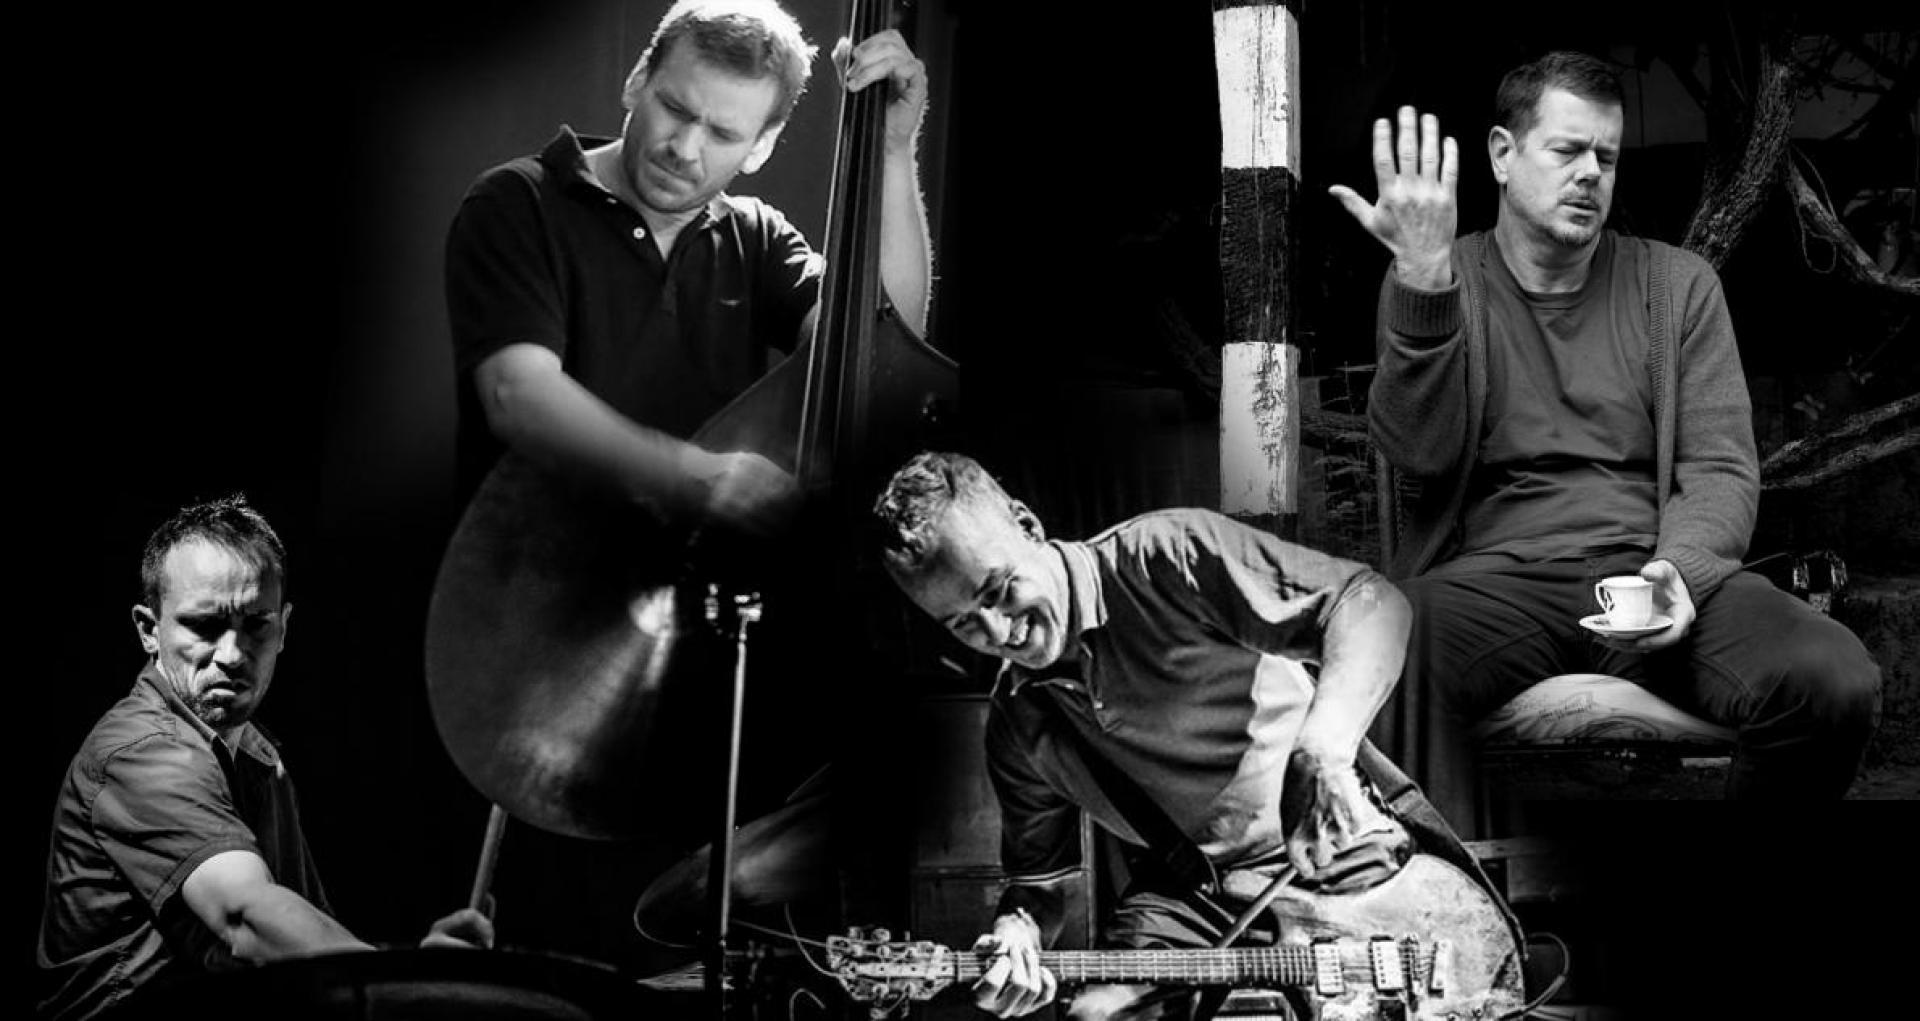 Hassles: Ken Vandermark, Terrie Ex, Paal Nilssen-Love